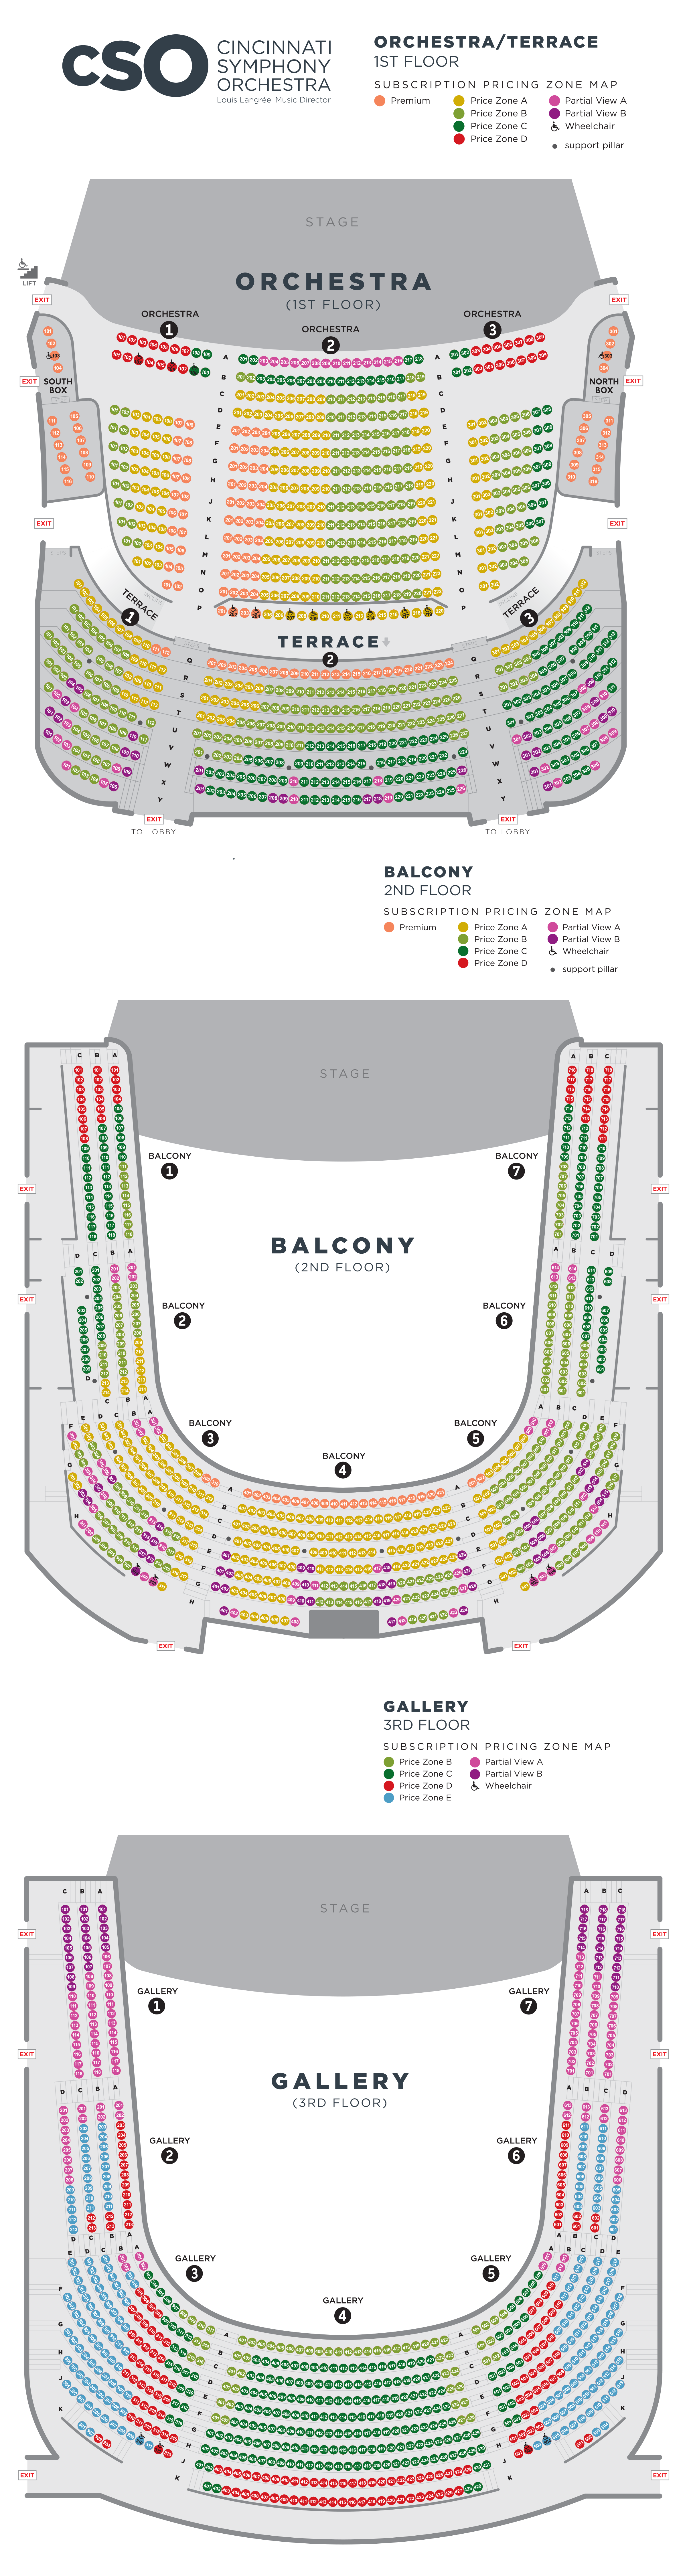 Cso Music Hall Seating Charts